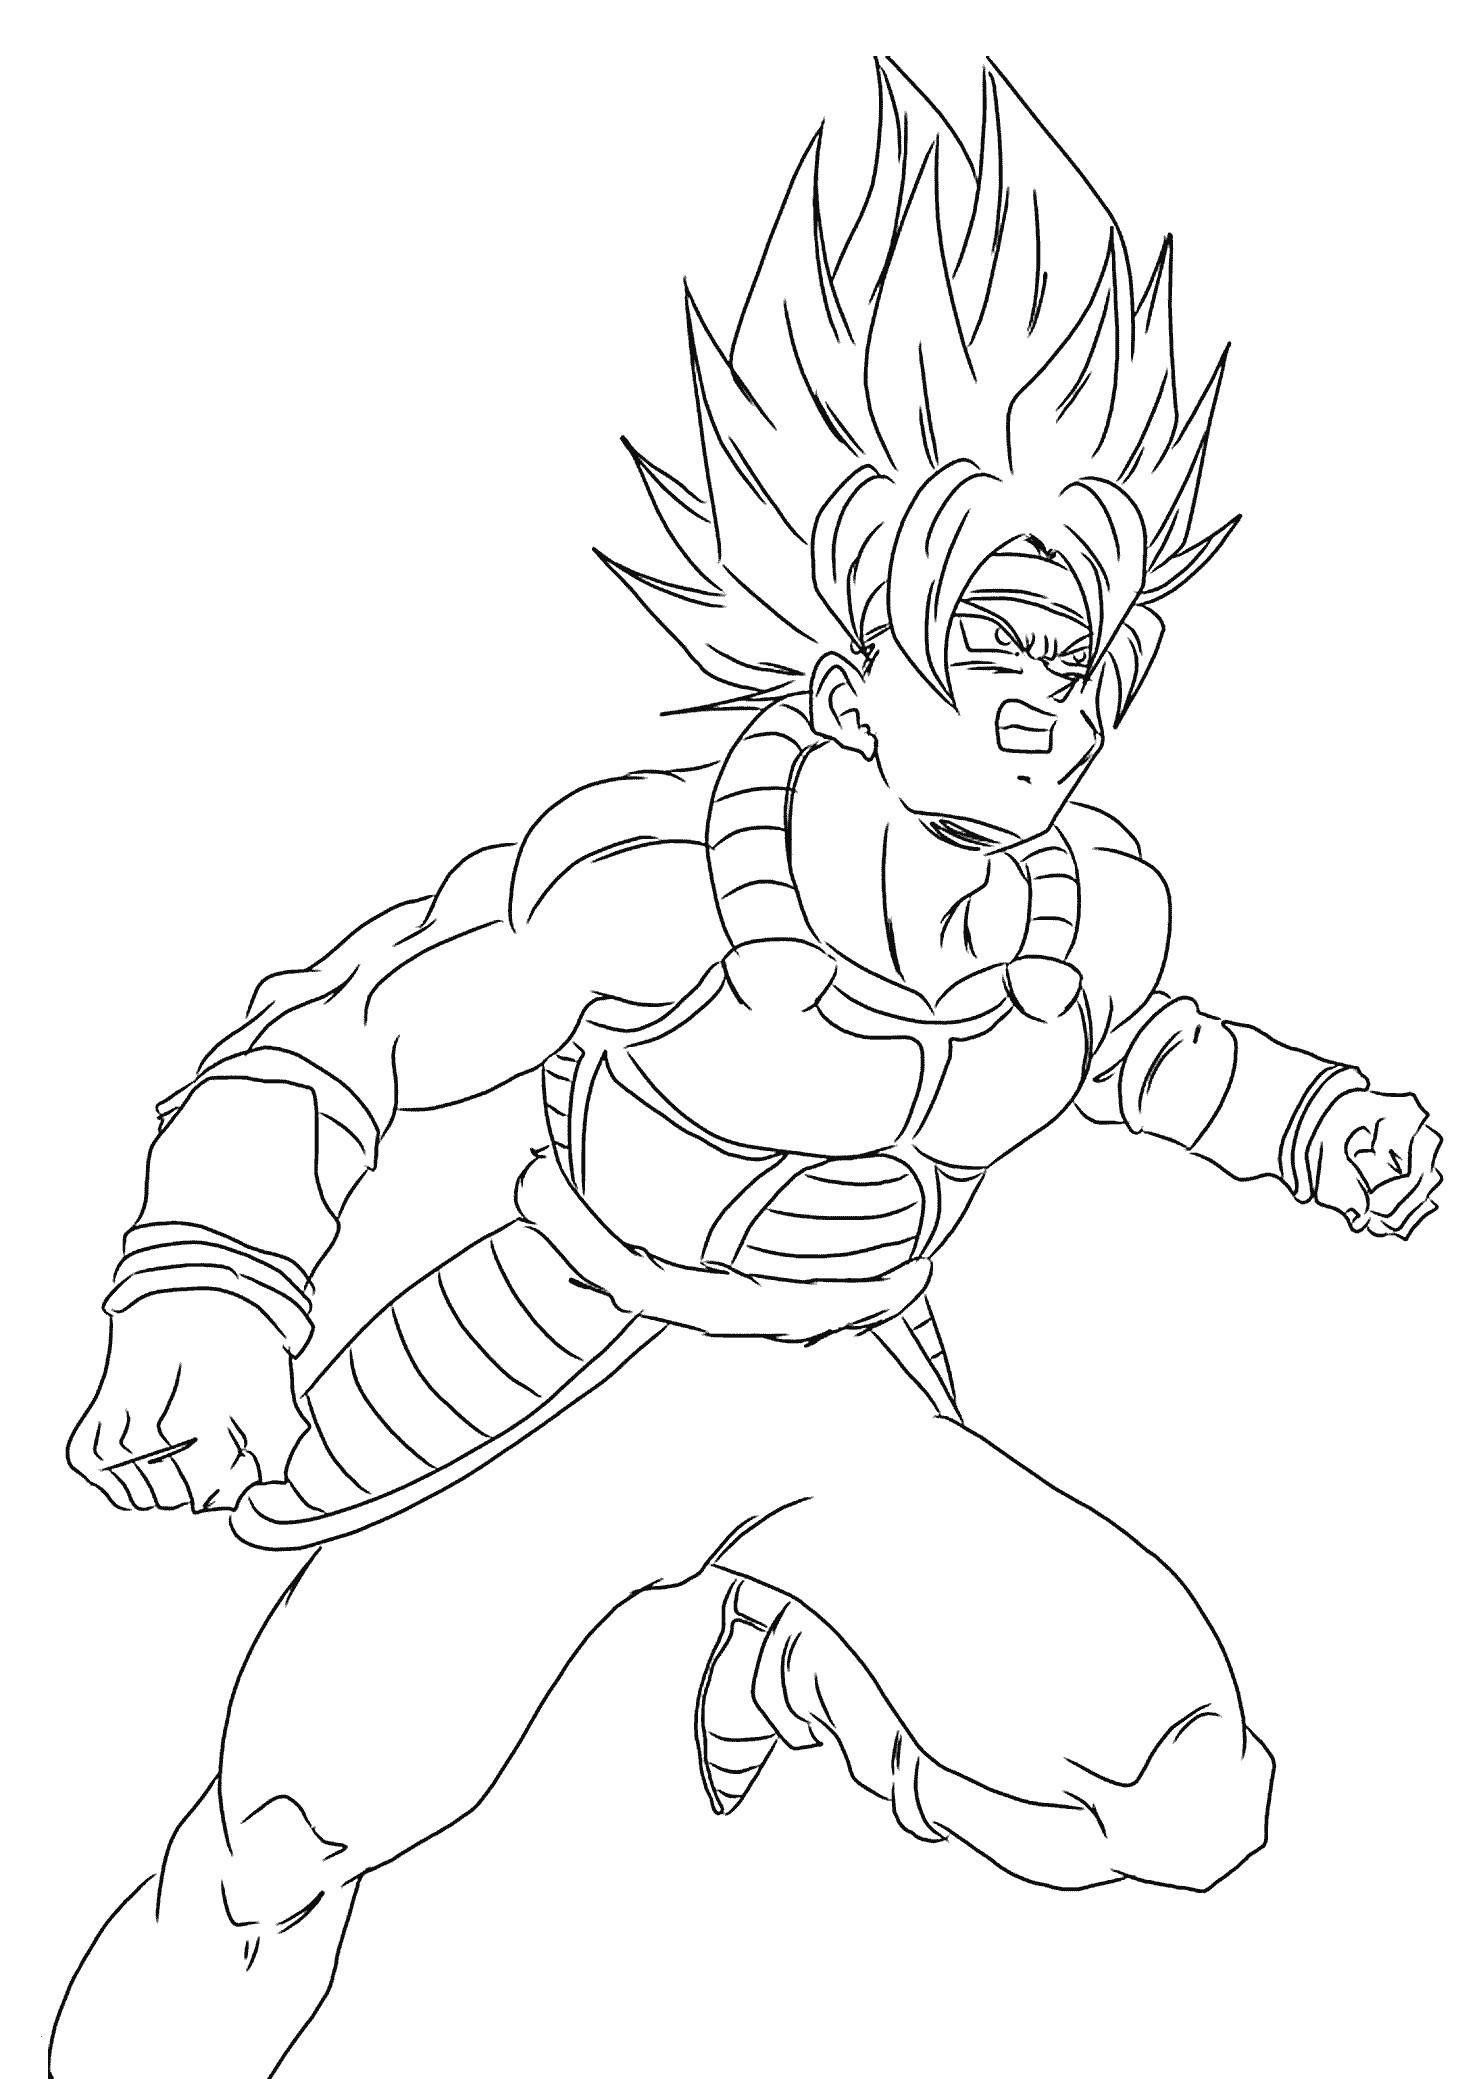 Dragon Ball Z Coloring New Dragon Ball Z Coloring Dibujos De Dragon Dibujo De Goku Vegeta Dibujo